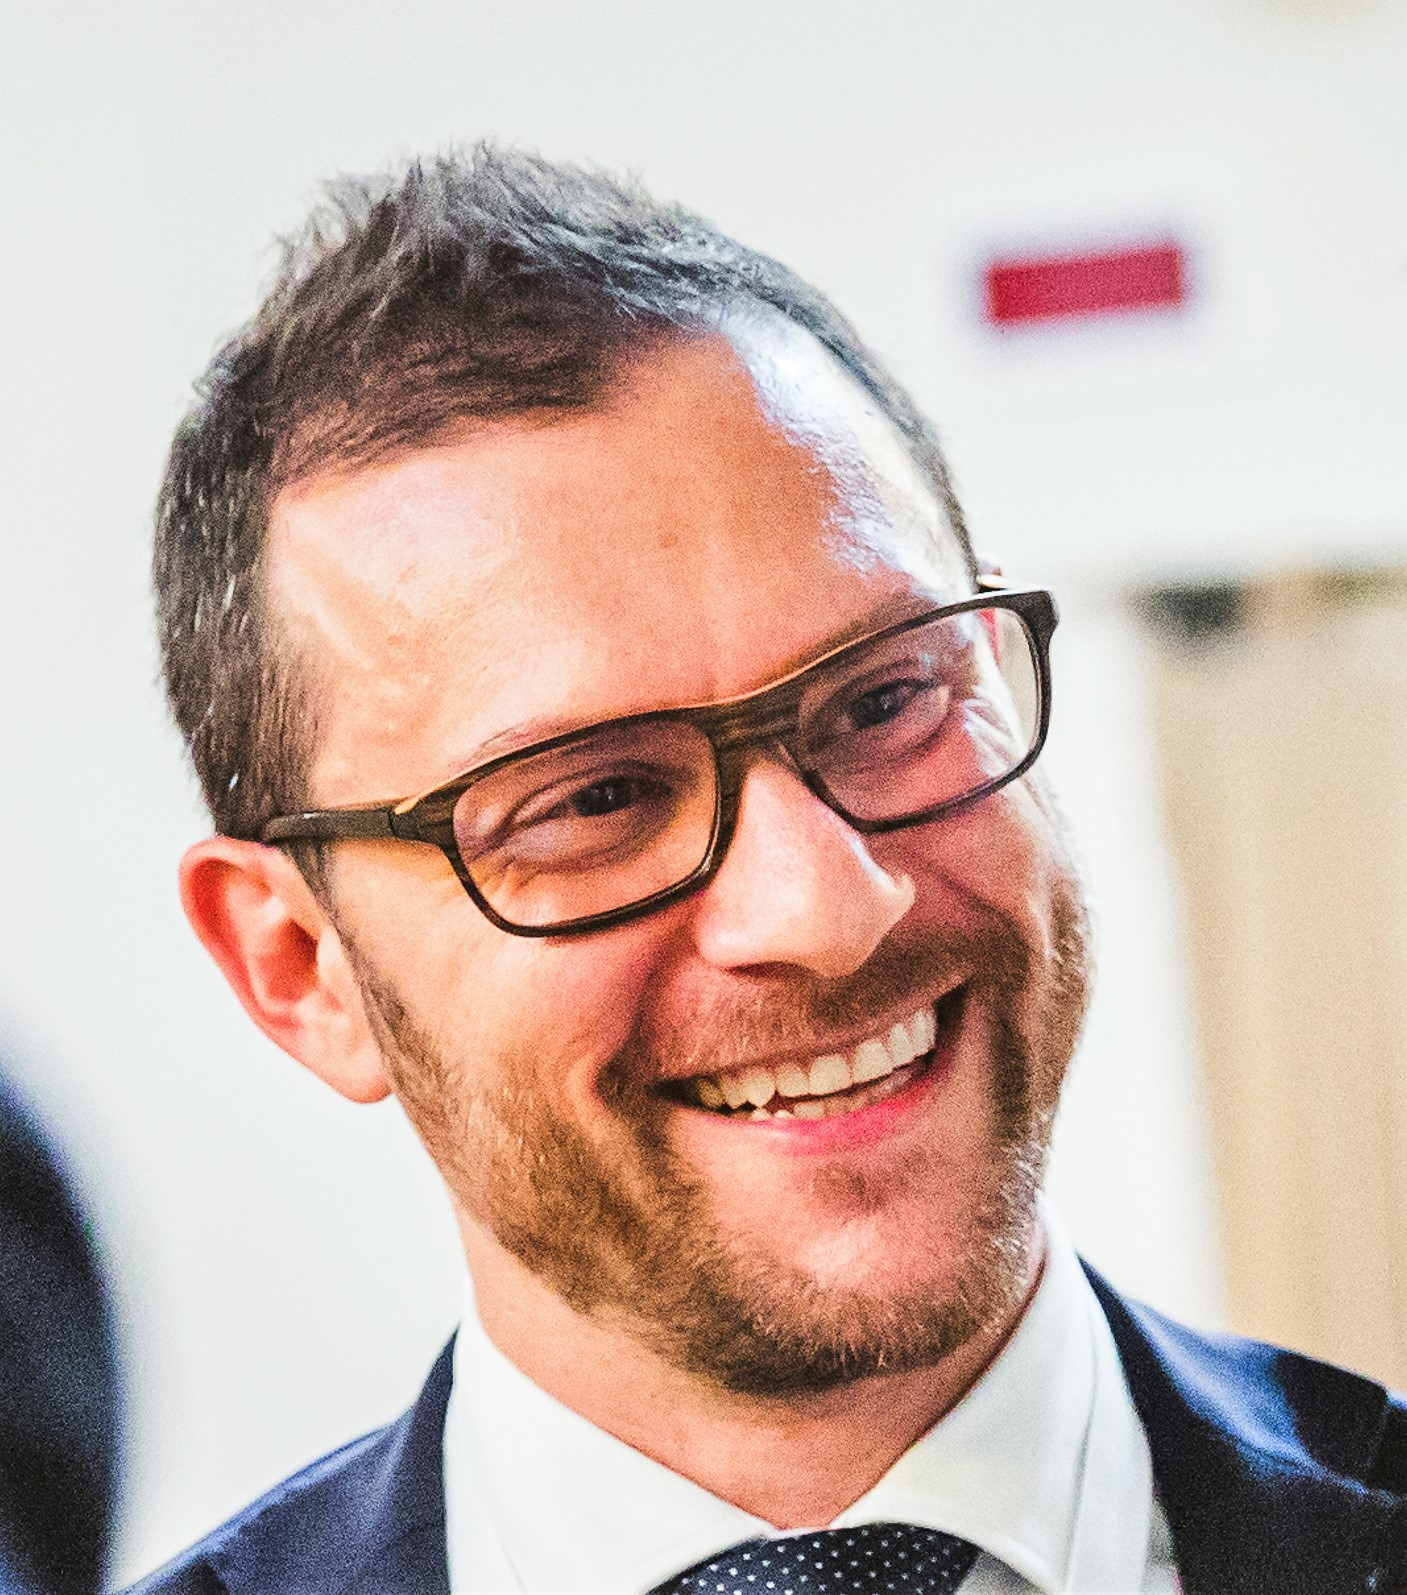 Marco Raspati